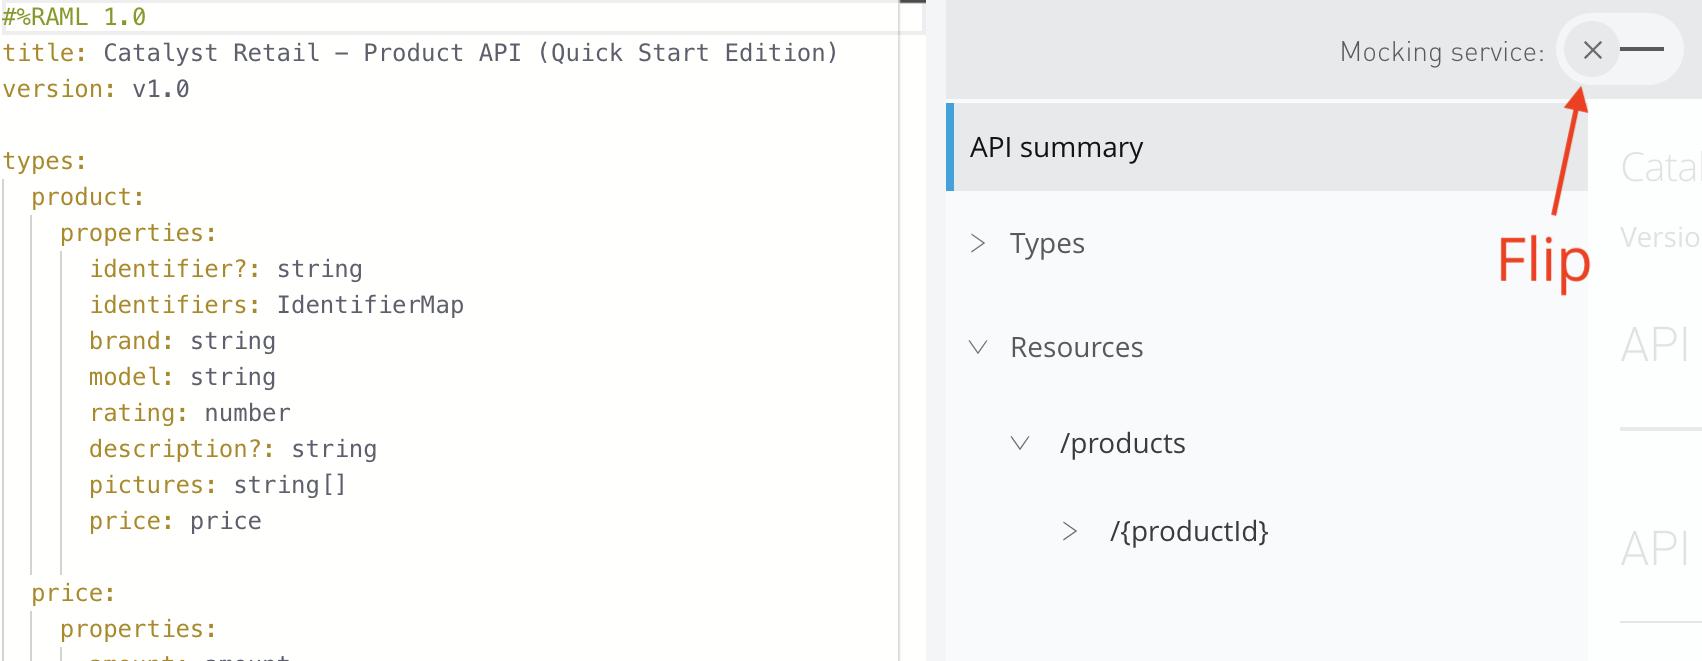 Start API mocking service